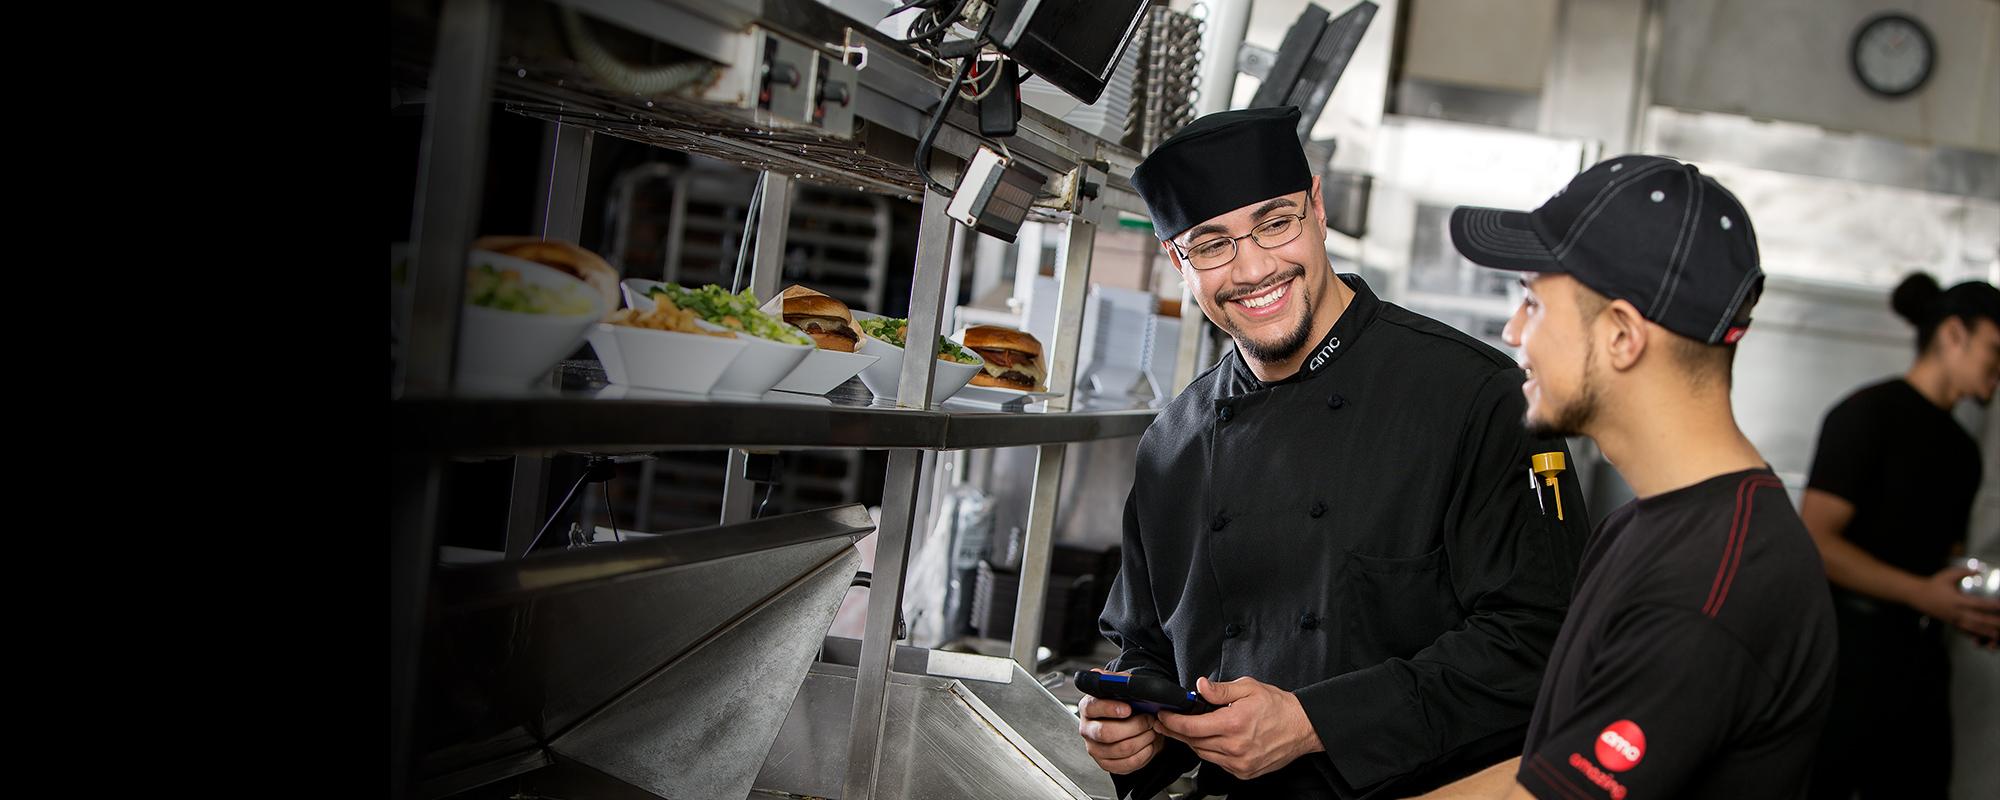 Theatre Management Kitchen Manager